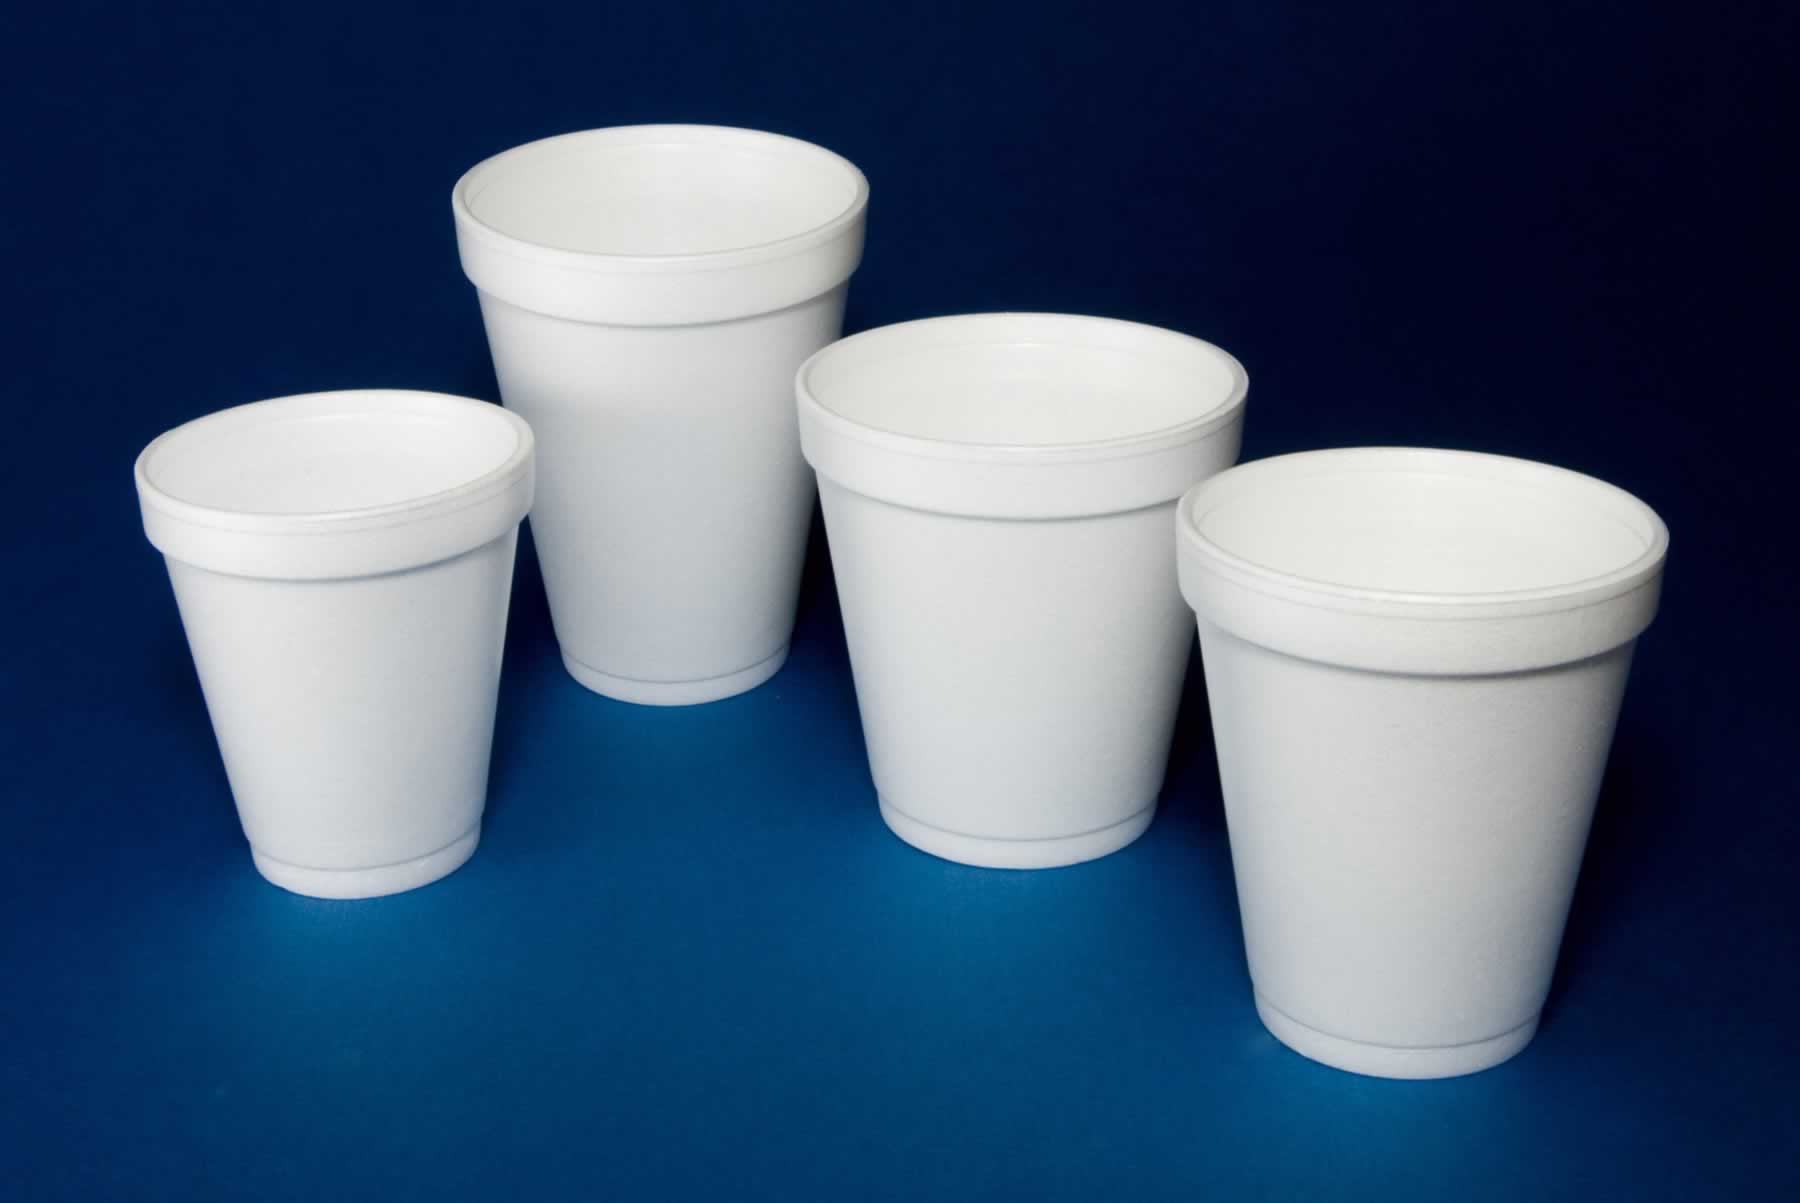 styrofoam cups and aluminum foil ou kosher certification